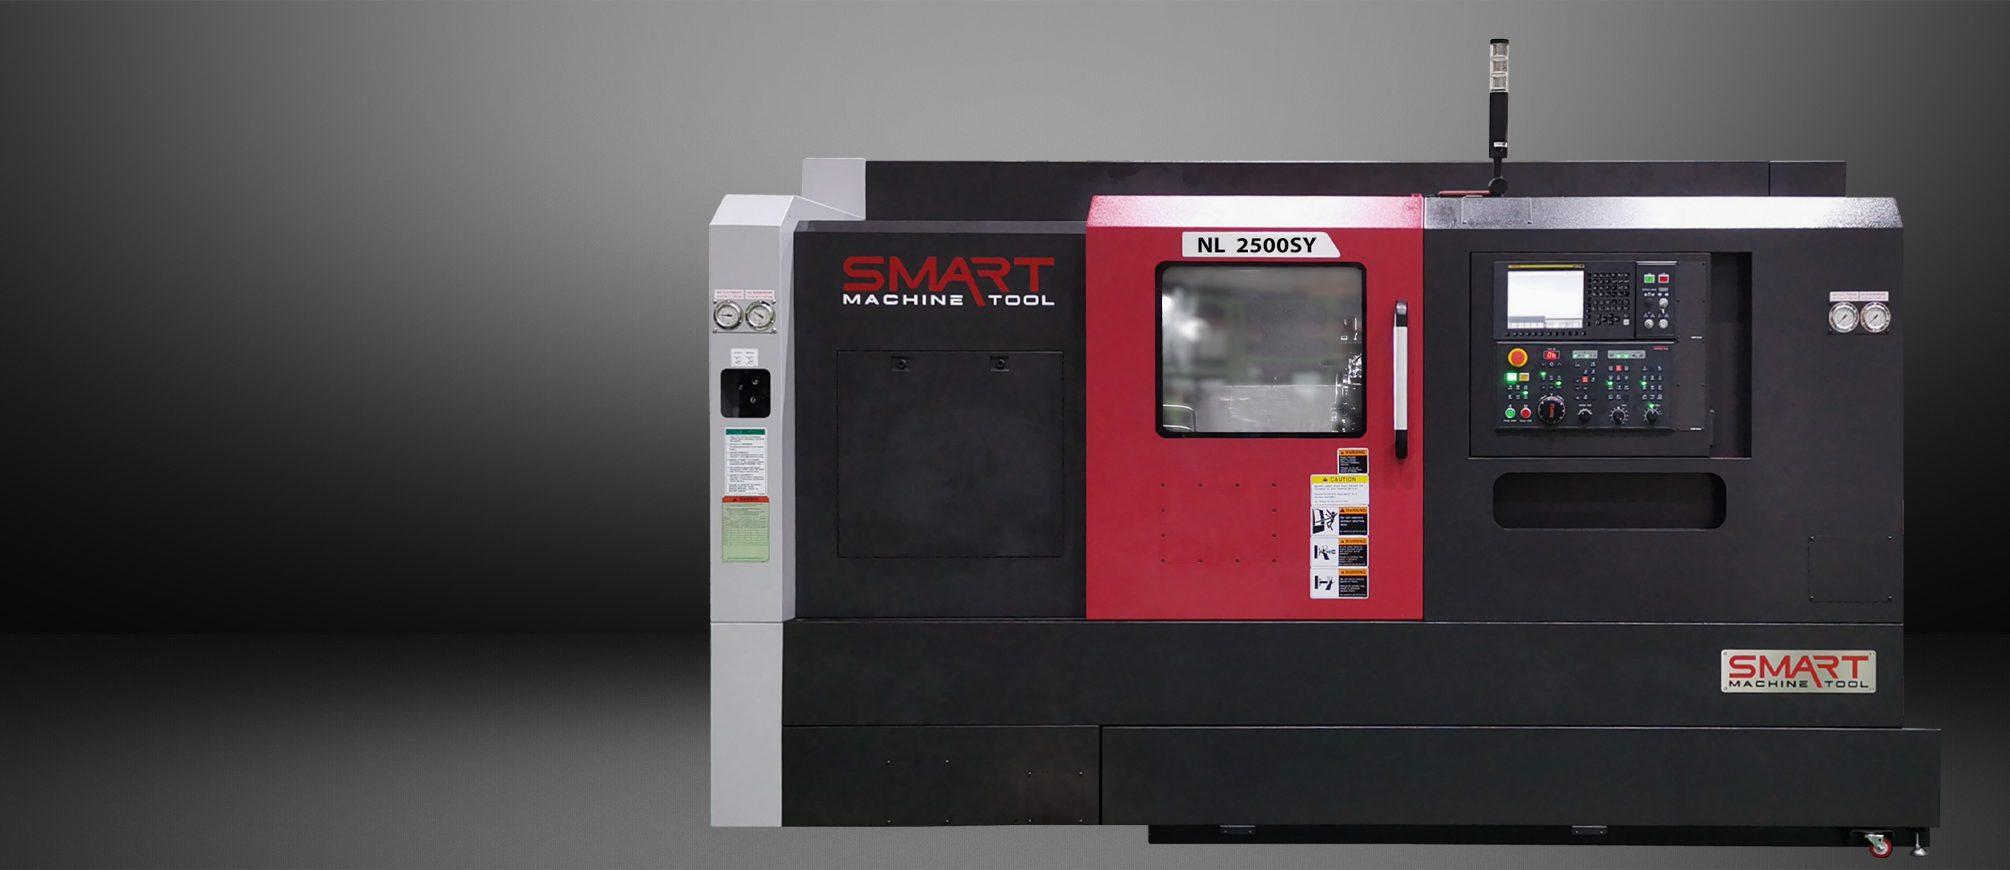 SMART NL 2500SY – BOX WAY – (10″ CHUCK) Multi-Axis CNC Lathes